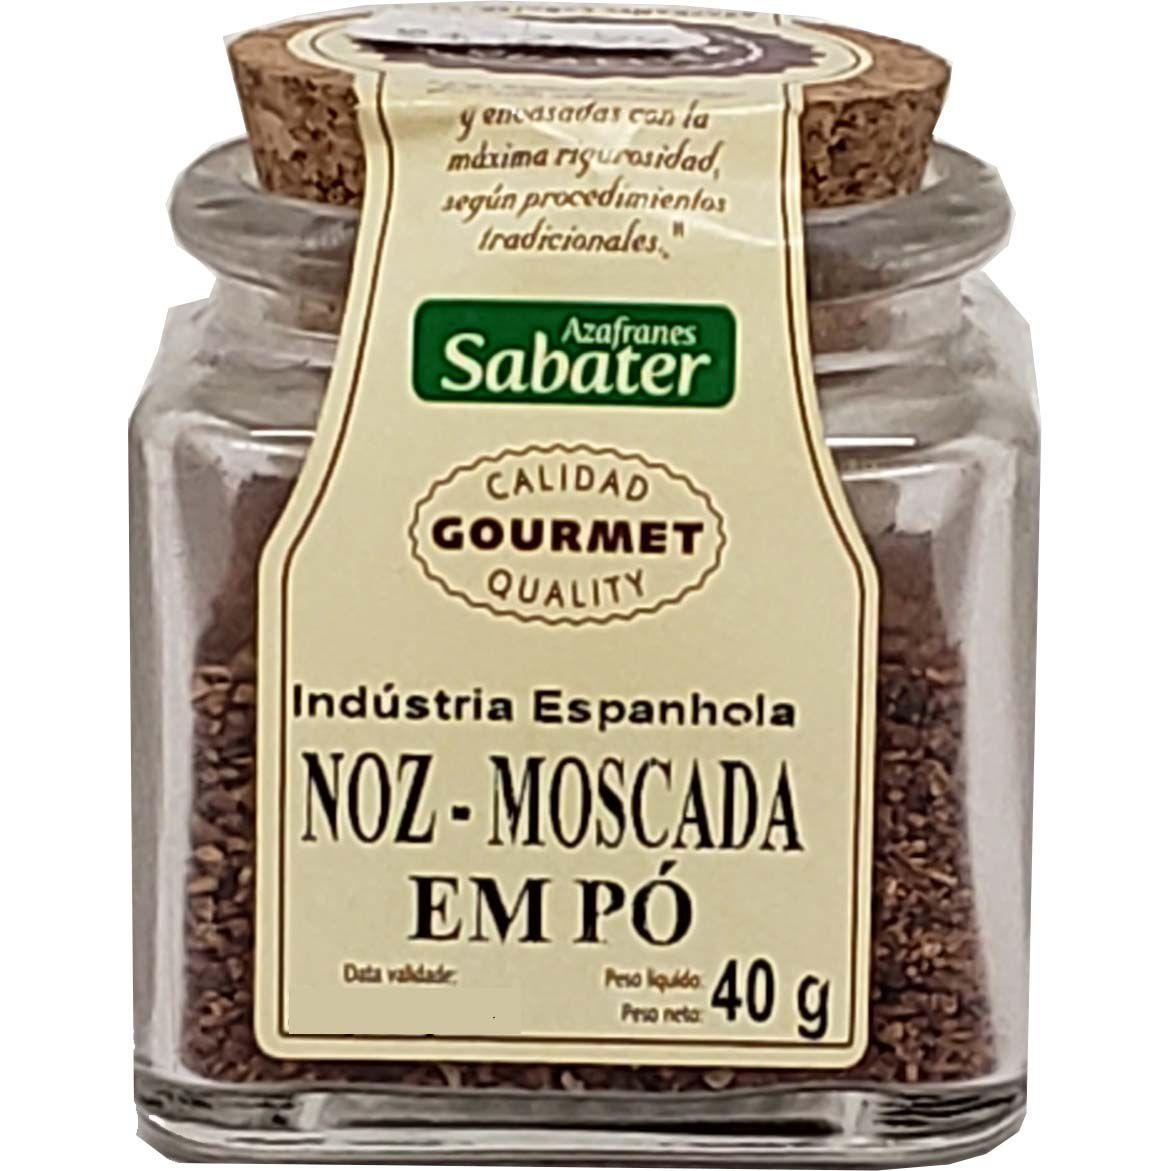 Noz Moscada Em Pó Azafranes Sabater - 40g -